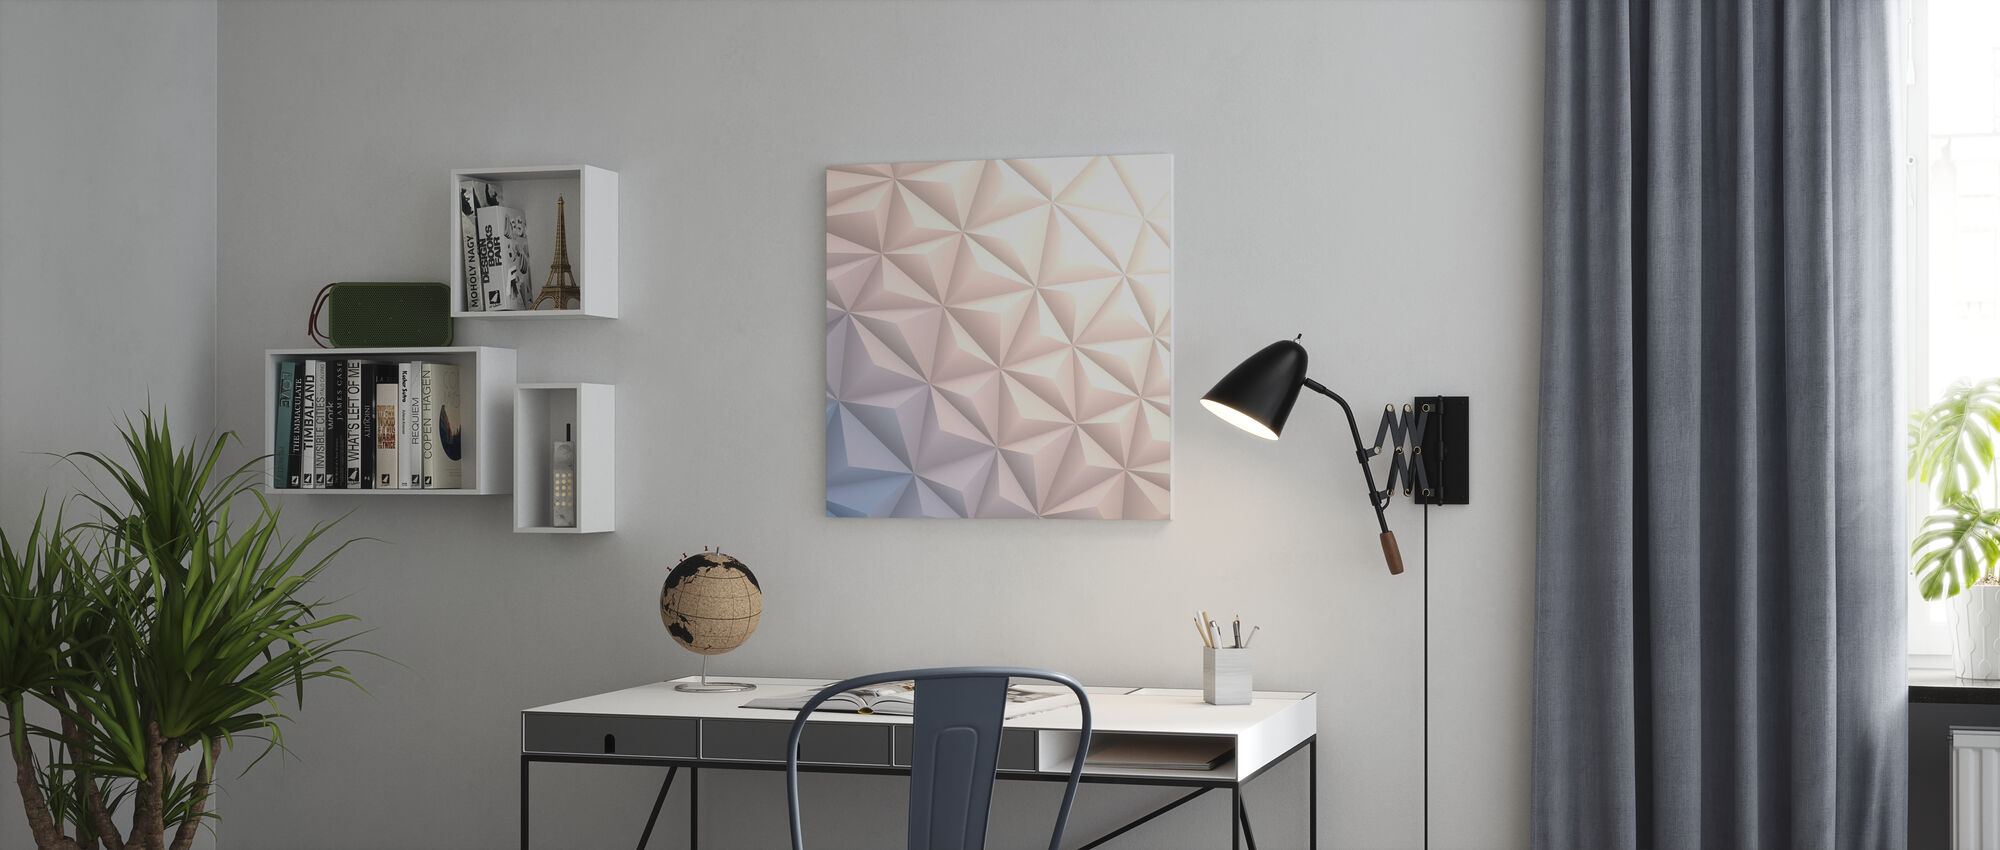 Geometric White - Canvas print - Office